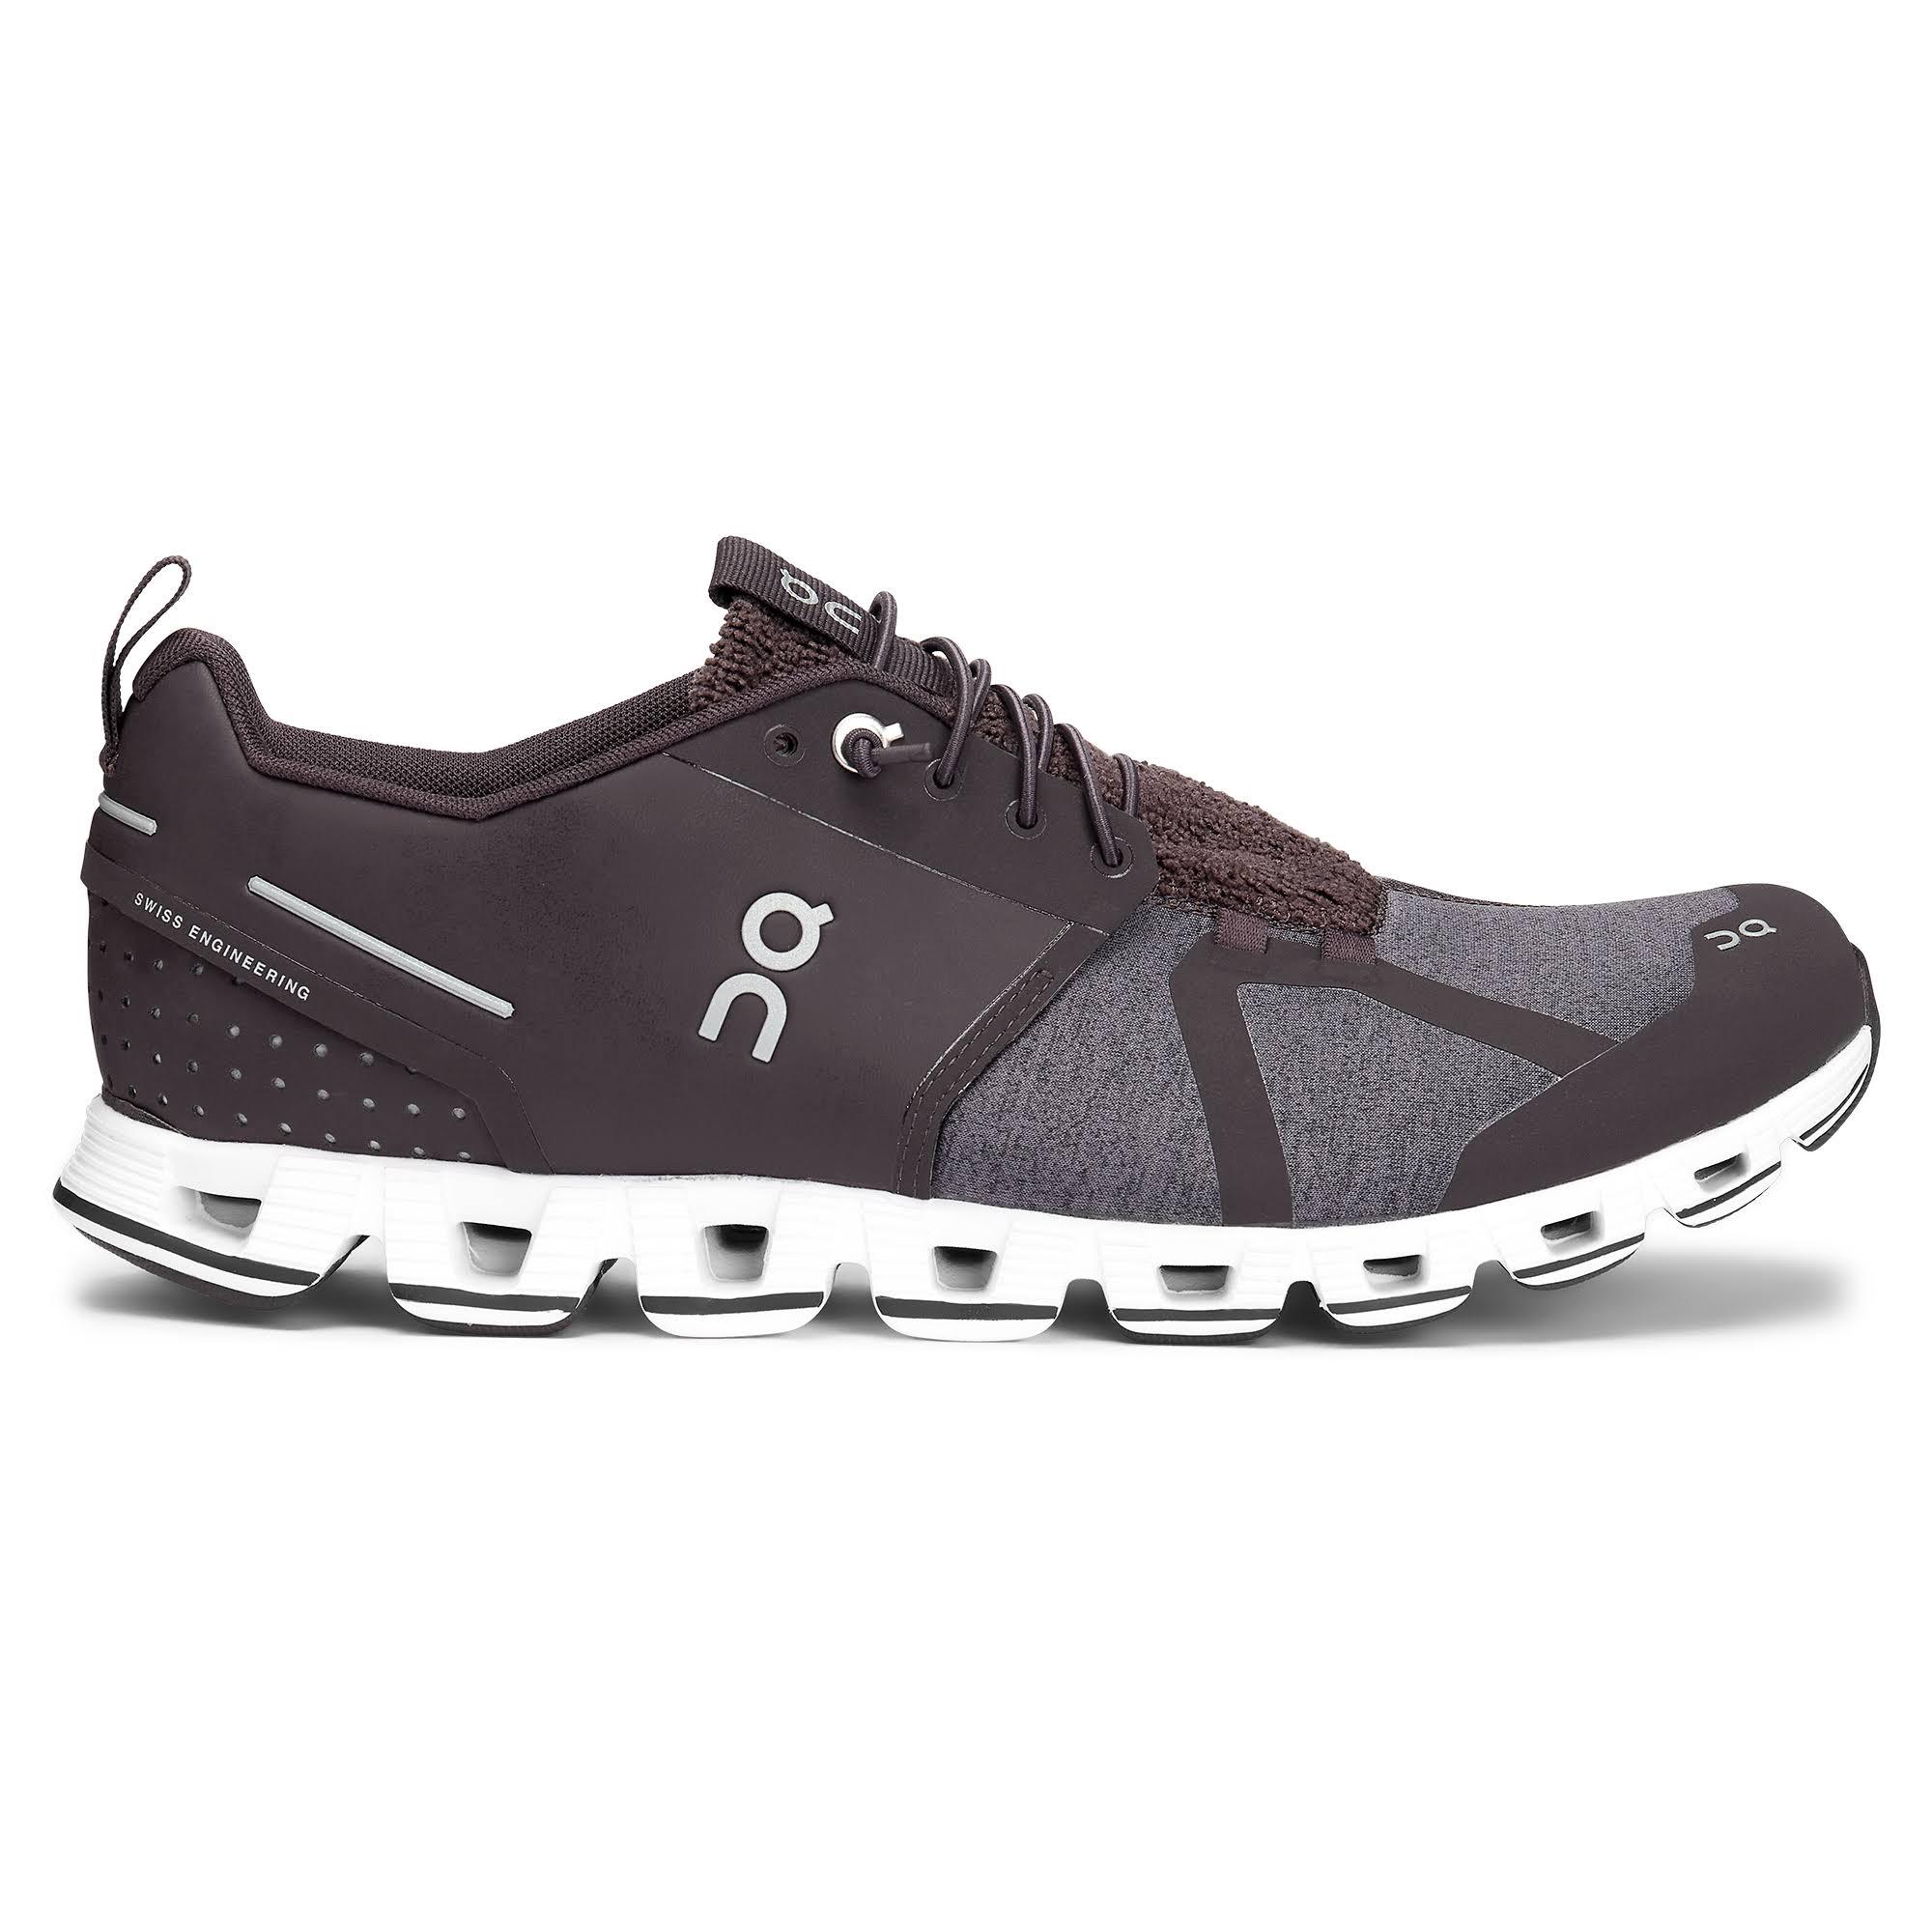 on Running Women's Cloud Terry Shoe (Size 39, Grey)